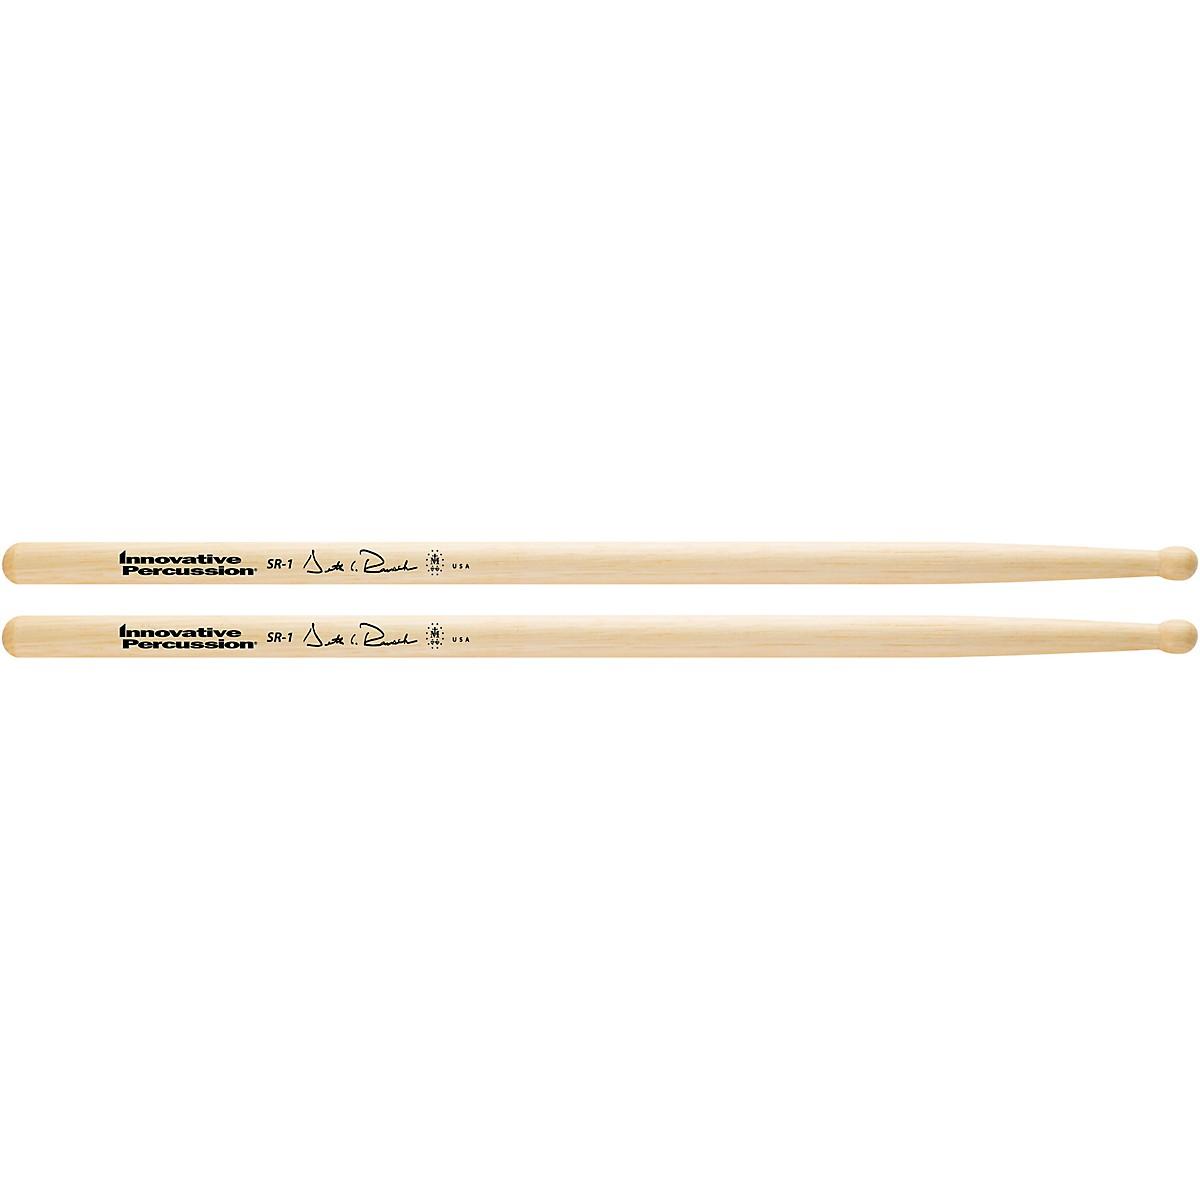 Innovative Percussion Seth Rausch Model Hickory Drum Sticks